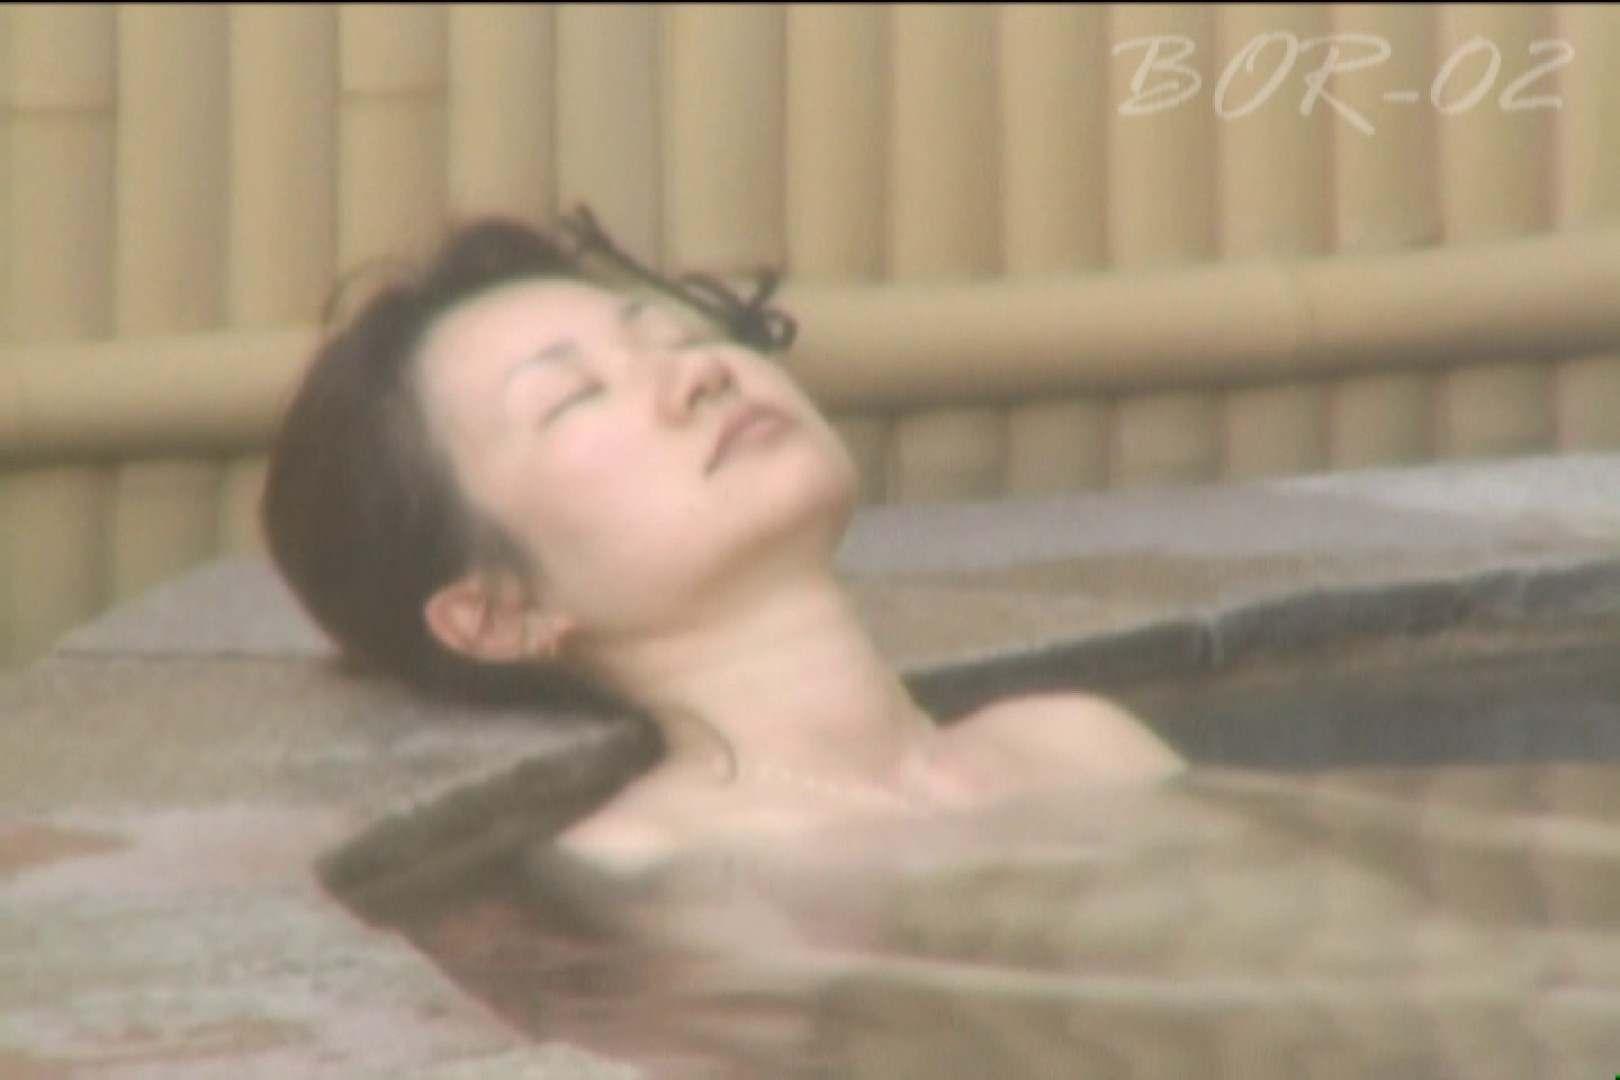 Aquaな露天風呂Vol.477 盗撮シリーズ | 露天風呂編  104PIX 63